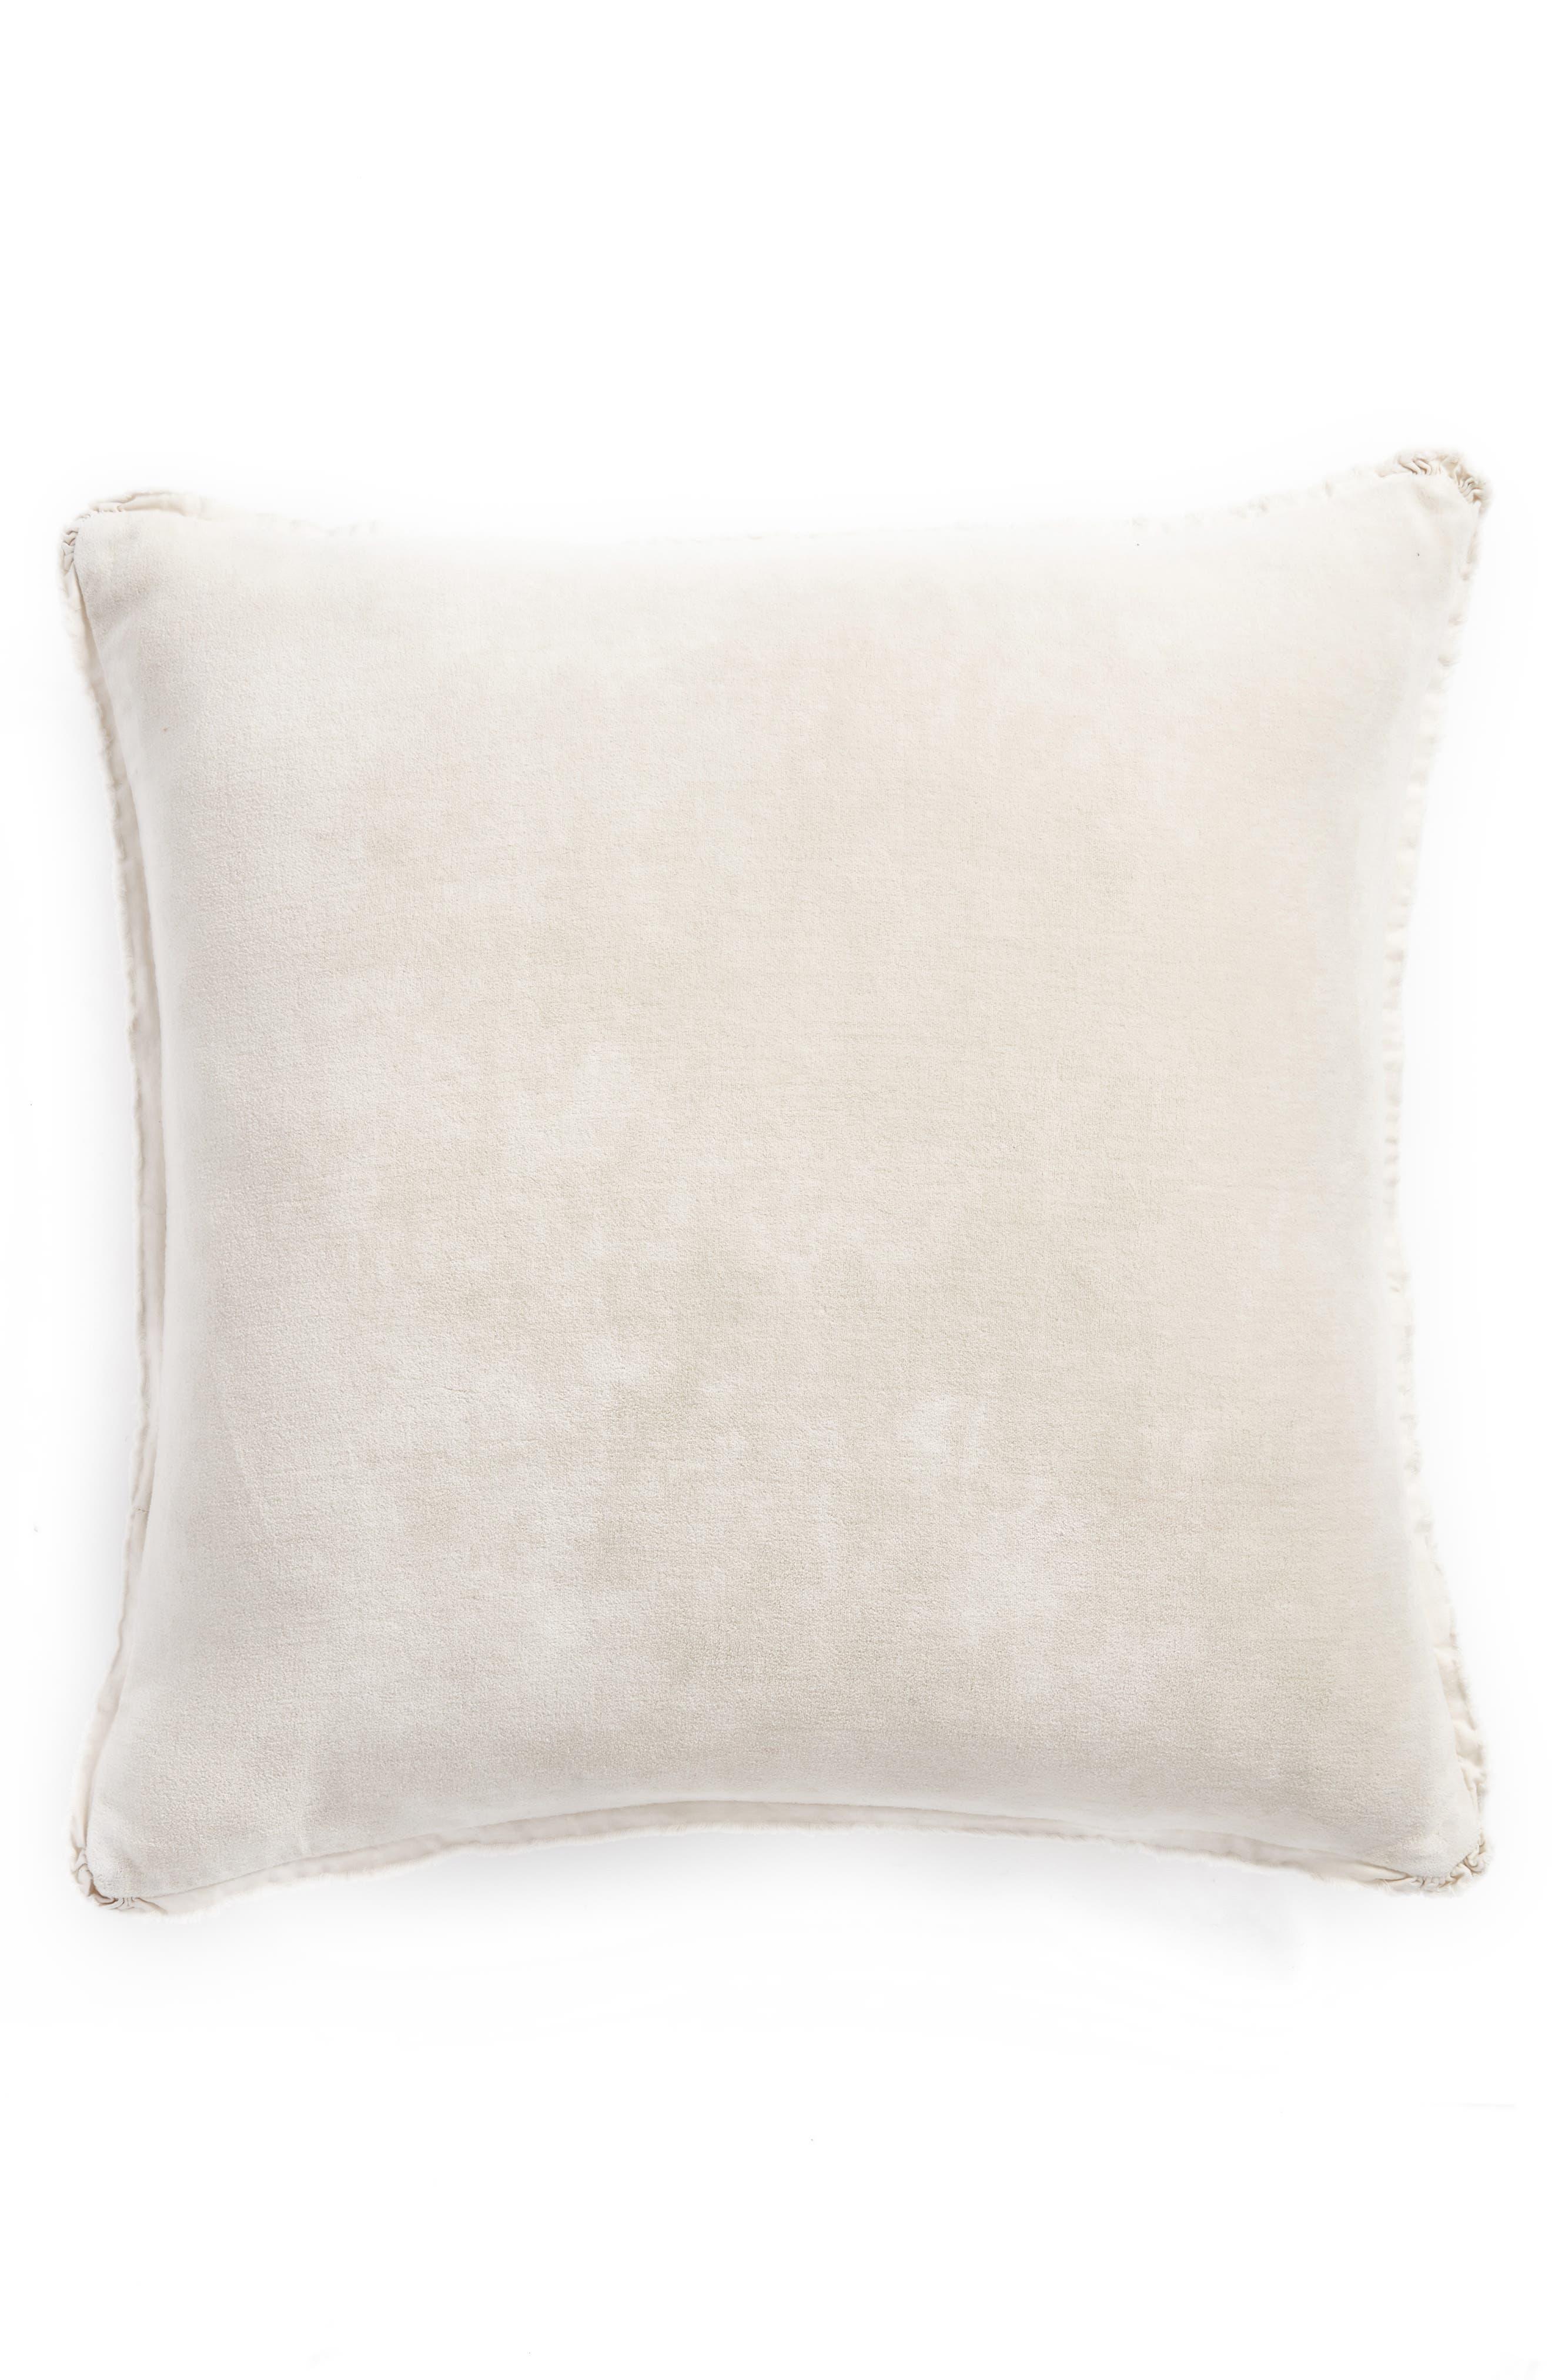 Stonewash Velvet Accent Pillow,                             Main thumbnail 1, color,                             GREY CHIME